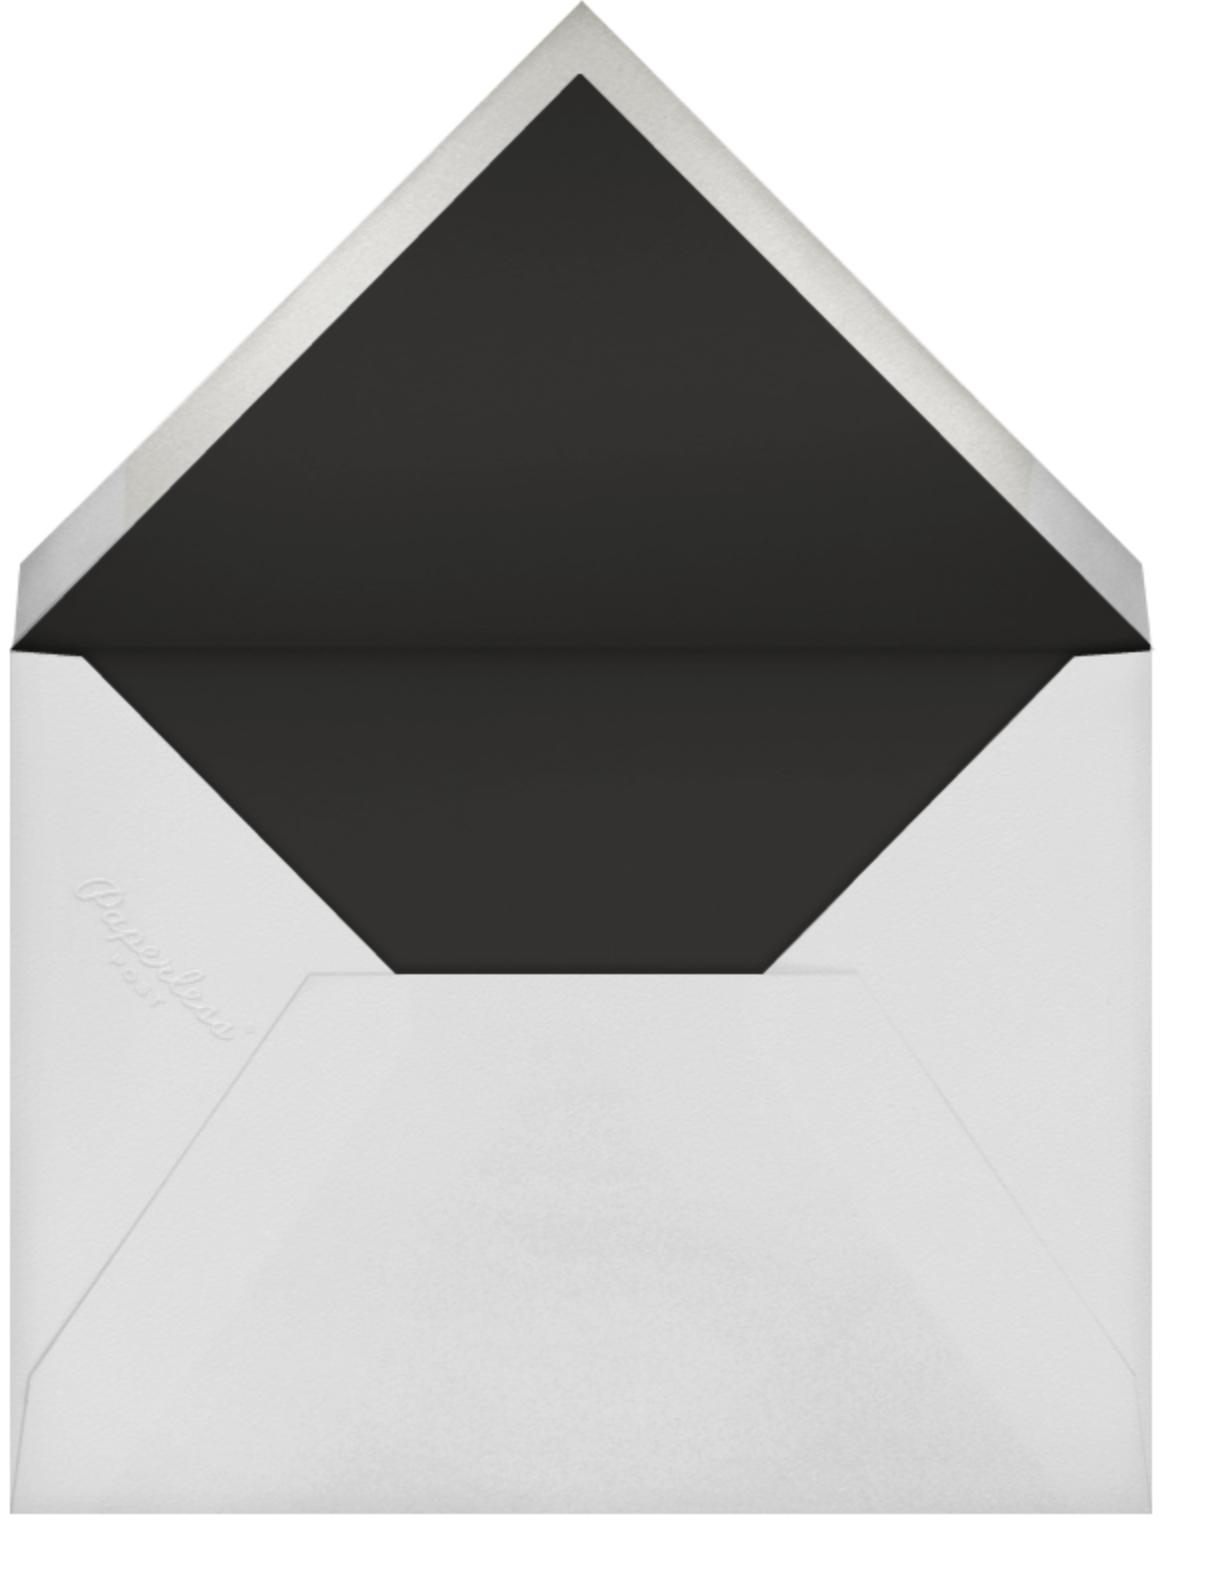 Tulip Dot - Black  - Oscar de la Renta - All - envelope back